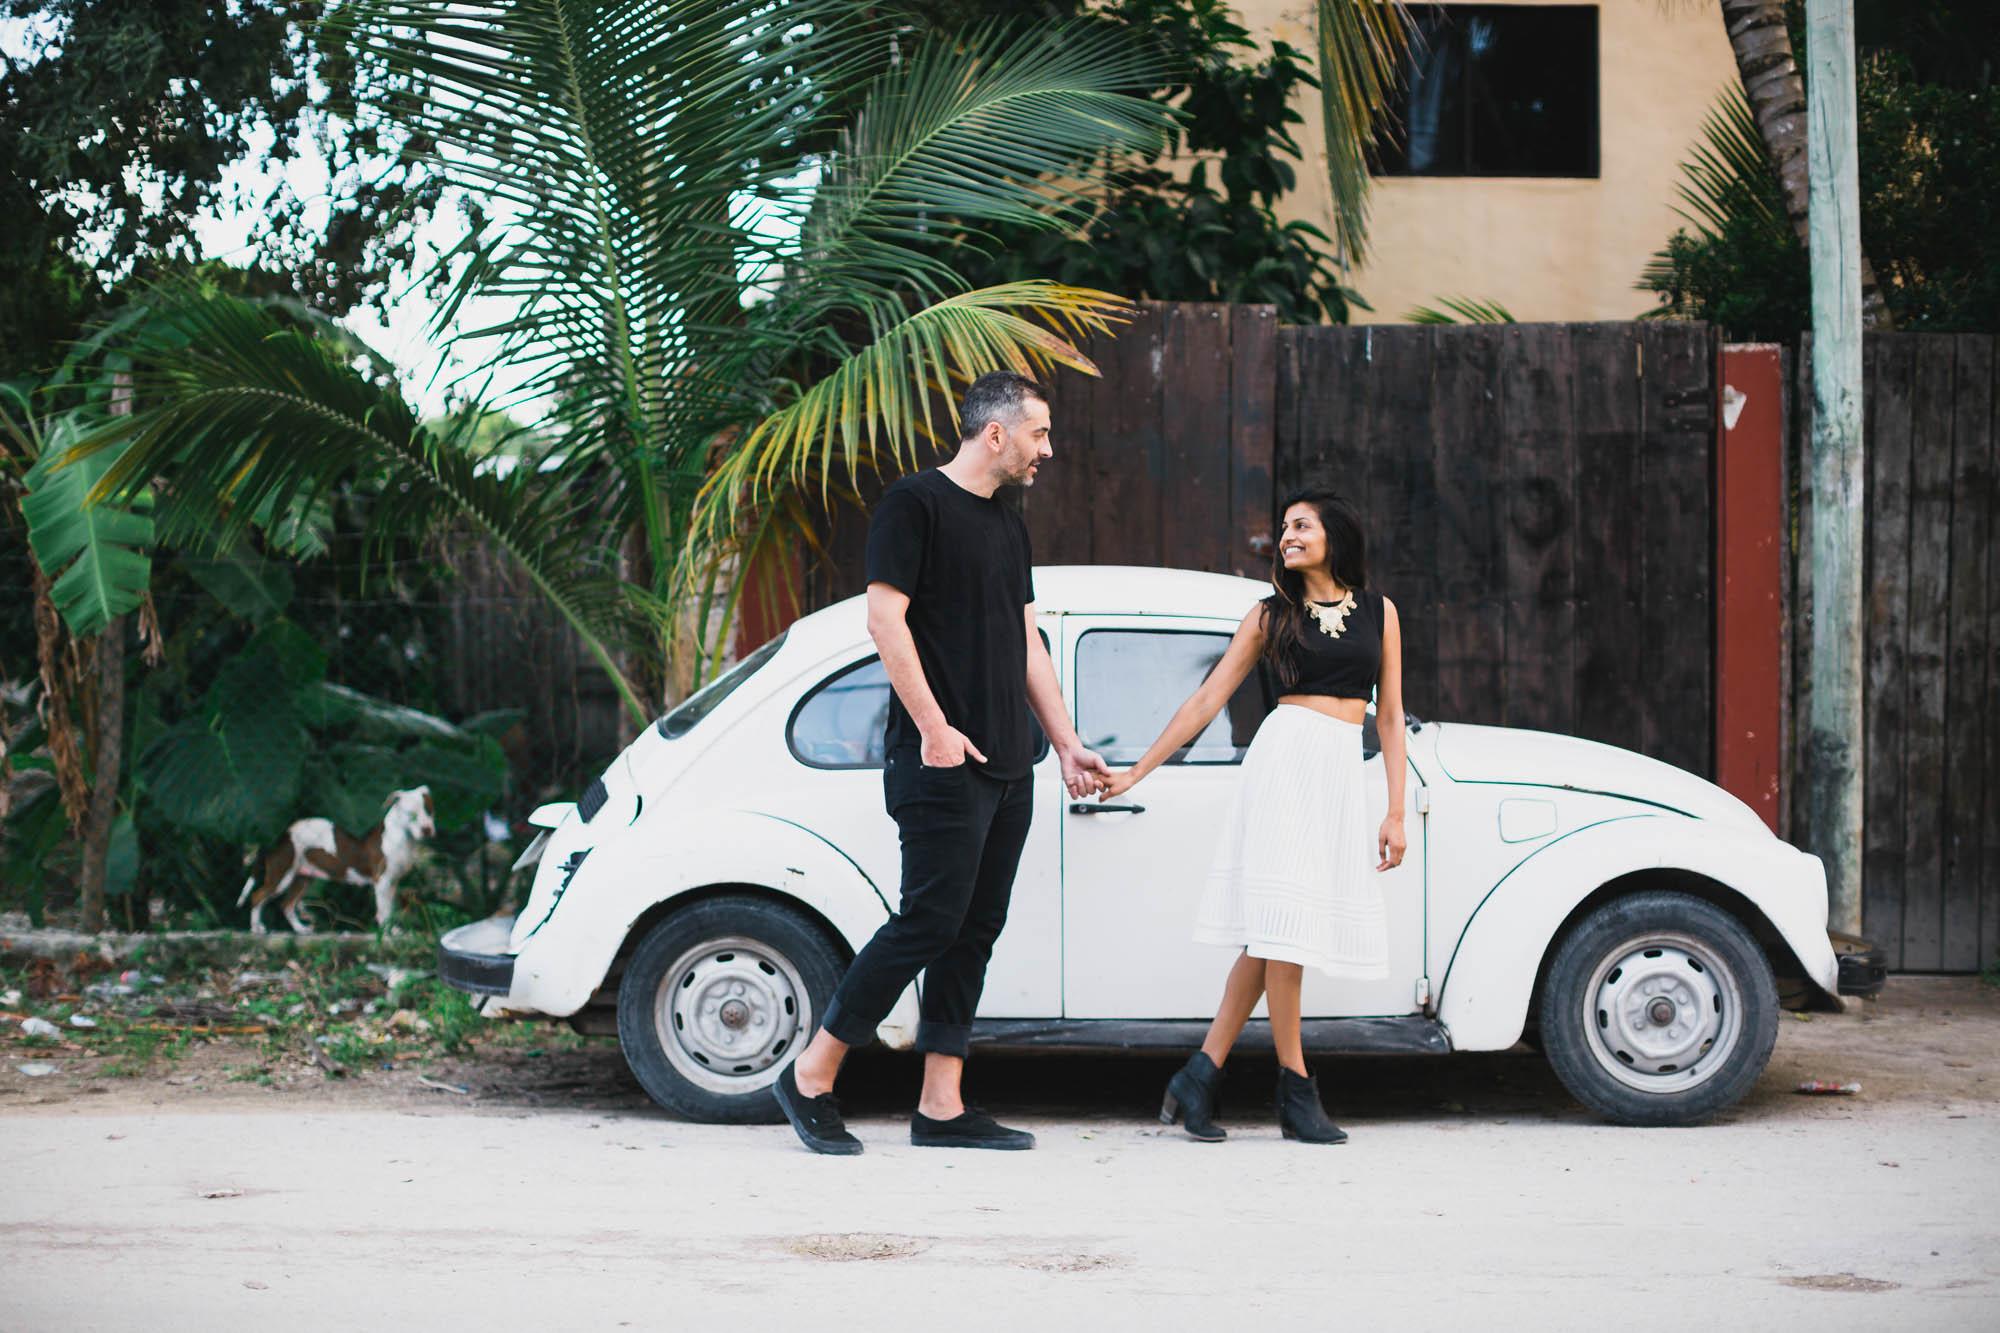 2016.12.26_NM-Tulum-Mexico-Destination-Engagement-Photography 31.jpg